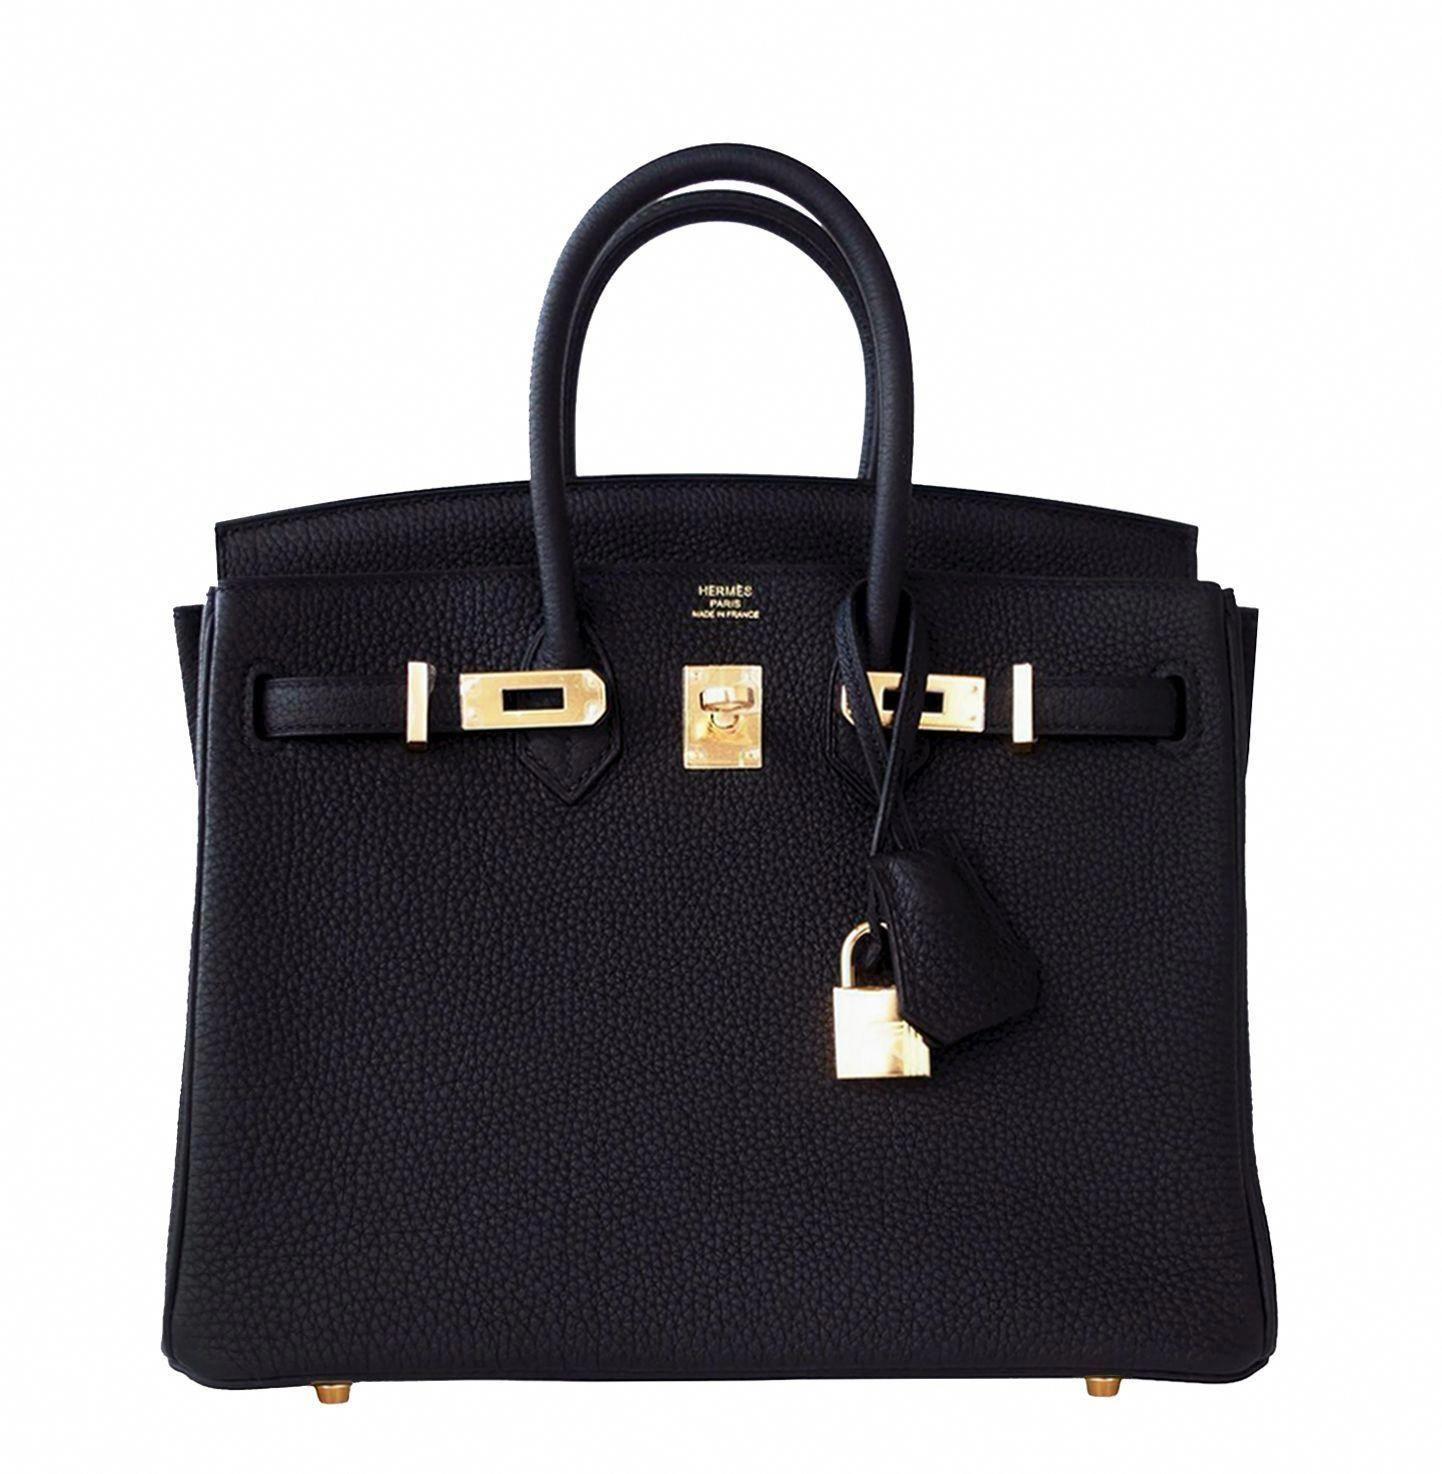 Hermes  Birkin  Bag Black Togo Gold Hardware  Designerhandbags ... 953f353357cb0